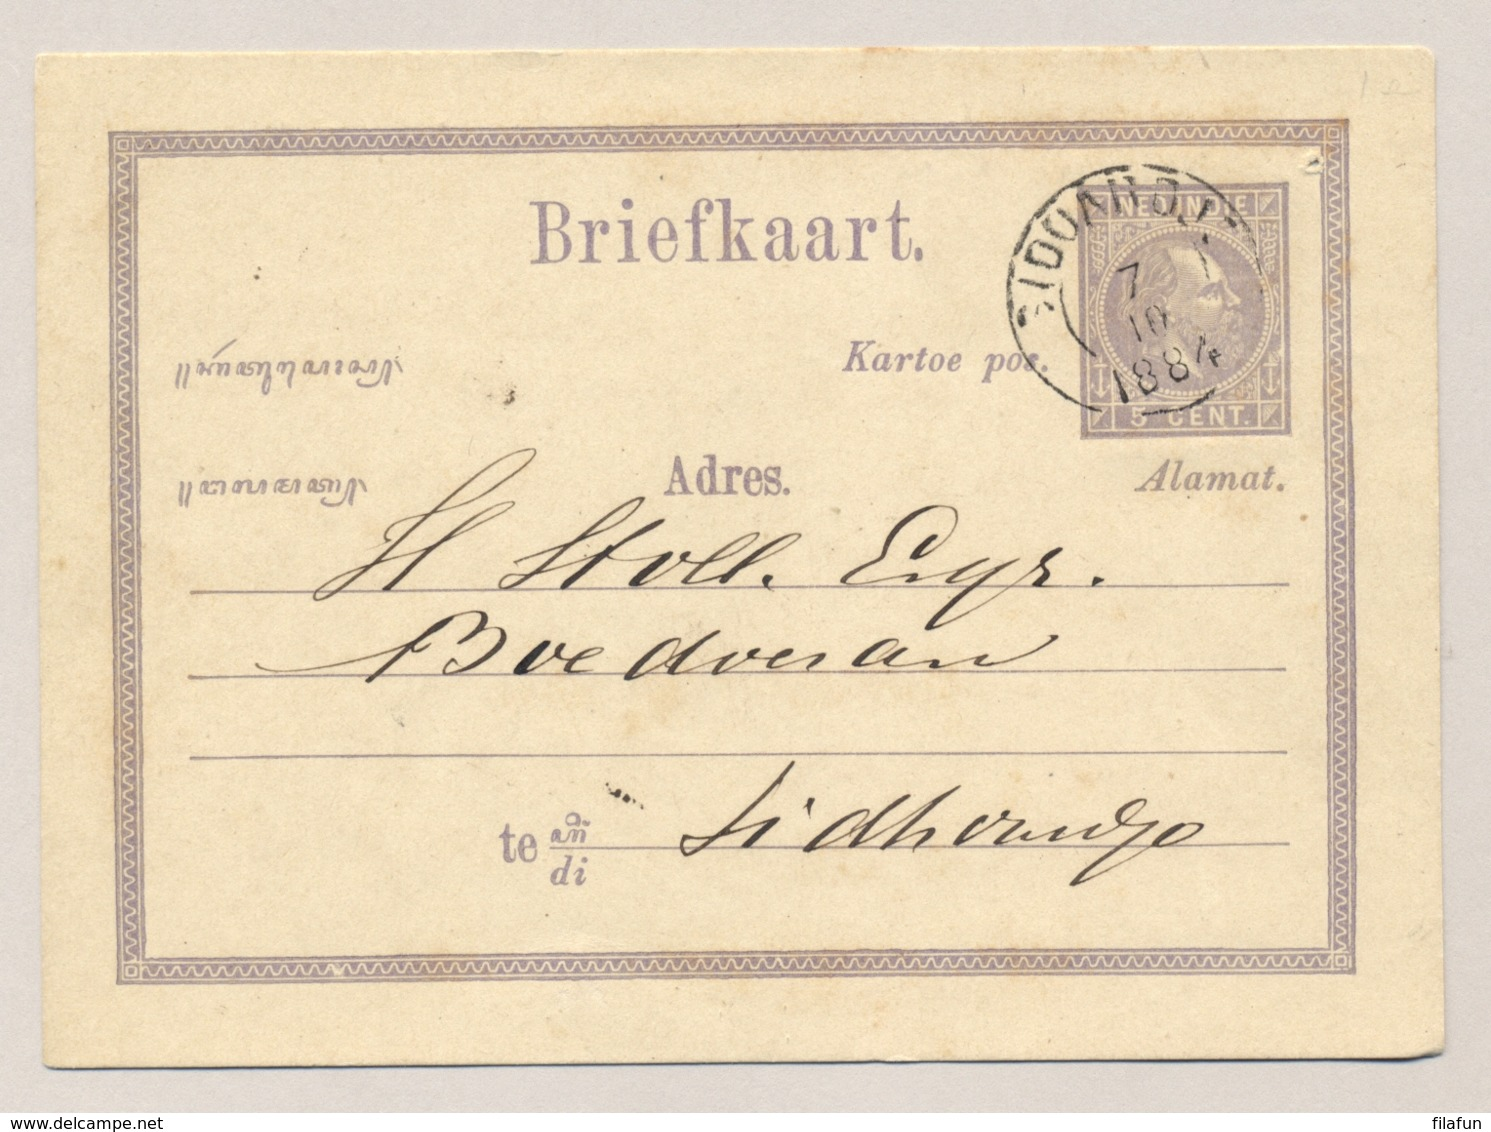 Nederlands Indië - 1884 - 5 Cent Willem III, Briefkaart G1 Lokaal Gebruikt KR SIDOARDJO - Indes Néerlandaises